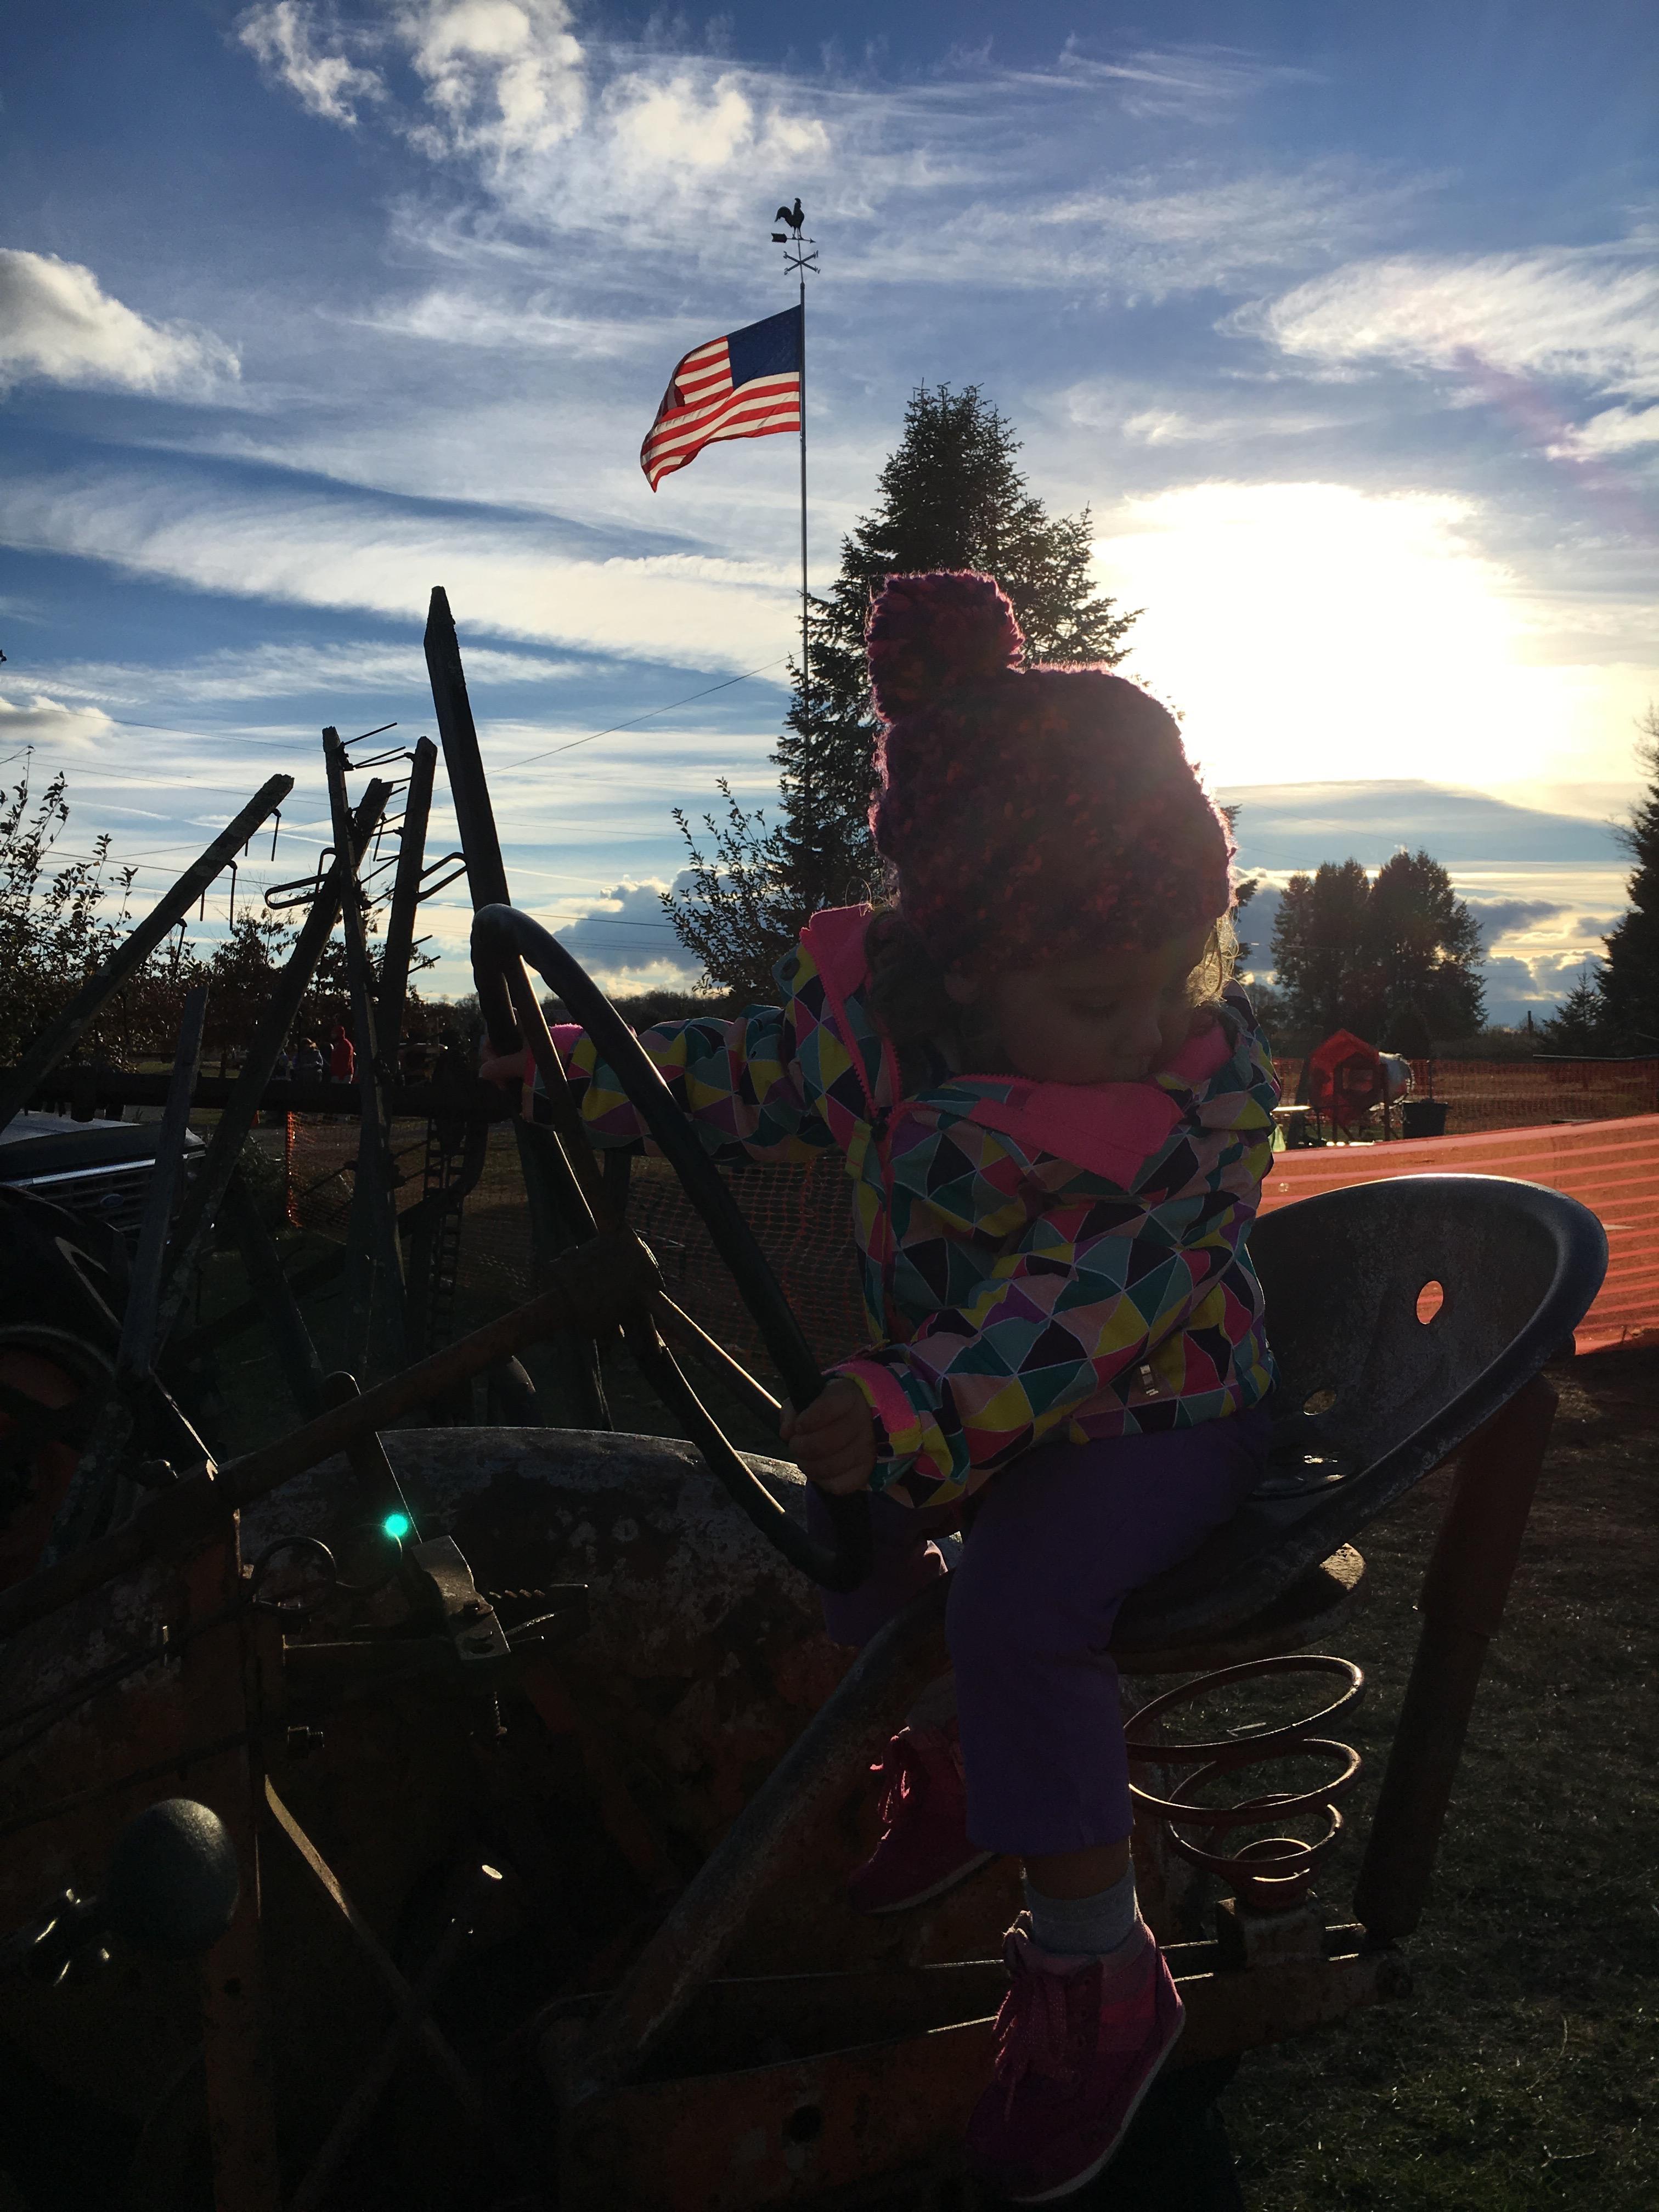 Kicking Off the Christmas Season at Wilkens Fruit & Fir Farm